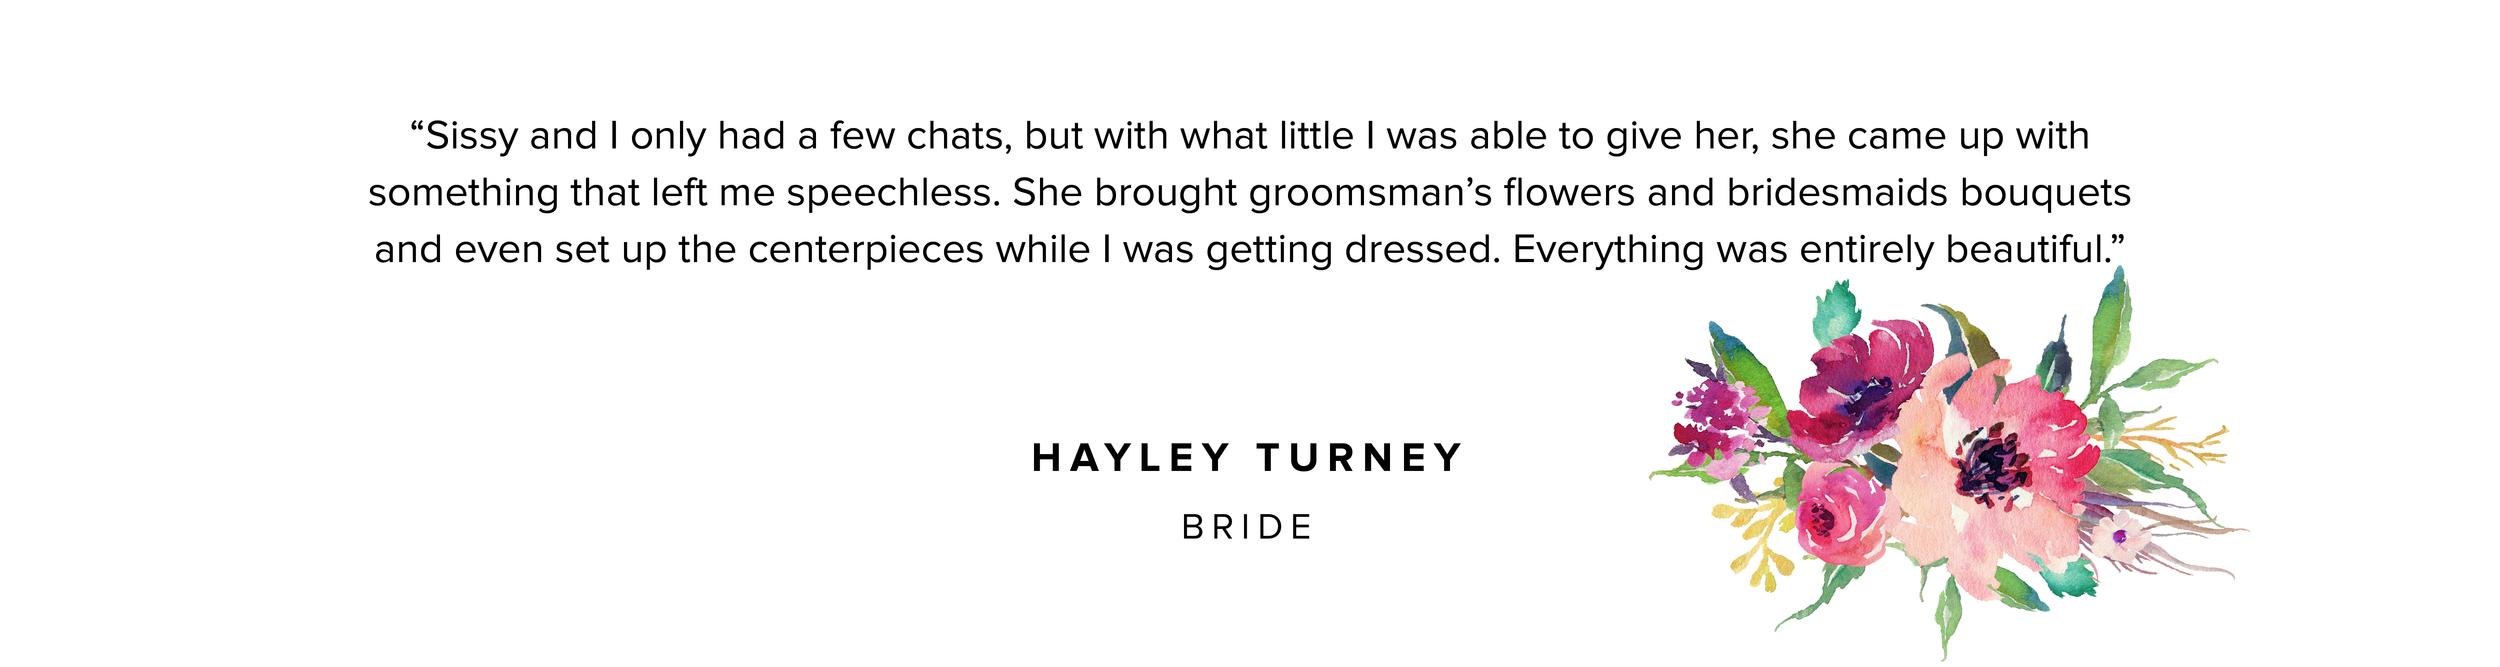 Review_Hayley Turney.jpg